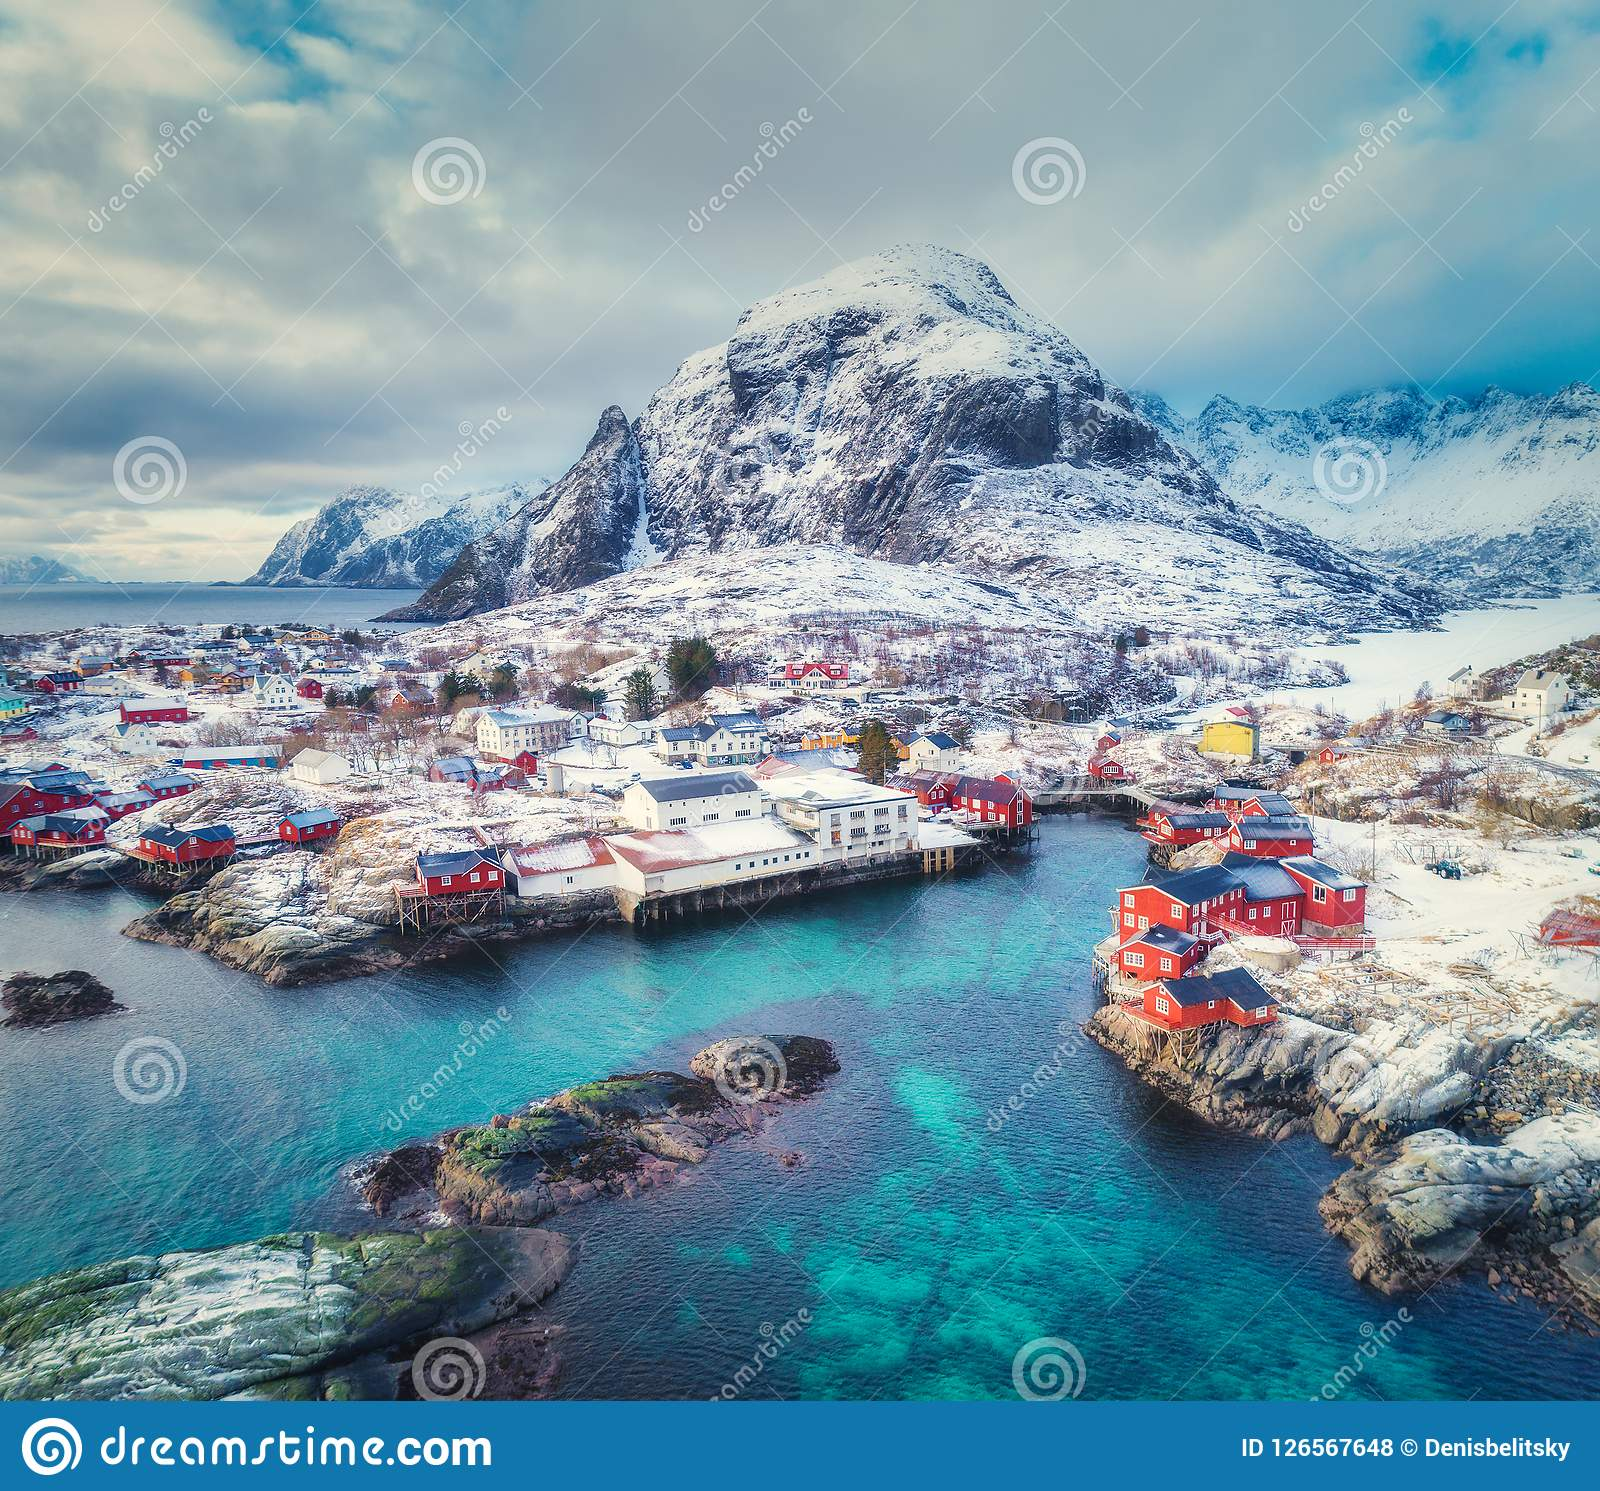 Вид с воздуха малой деревни на горе в зиме